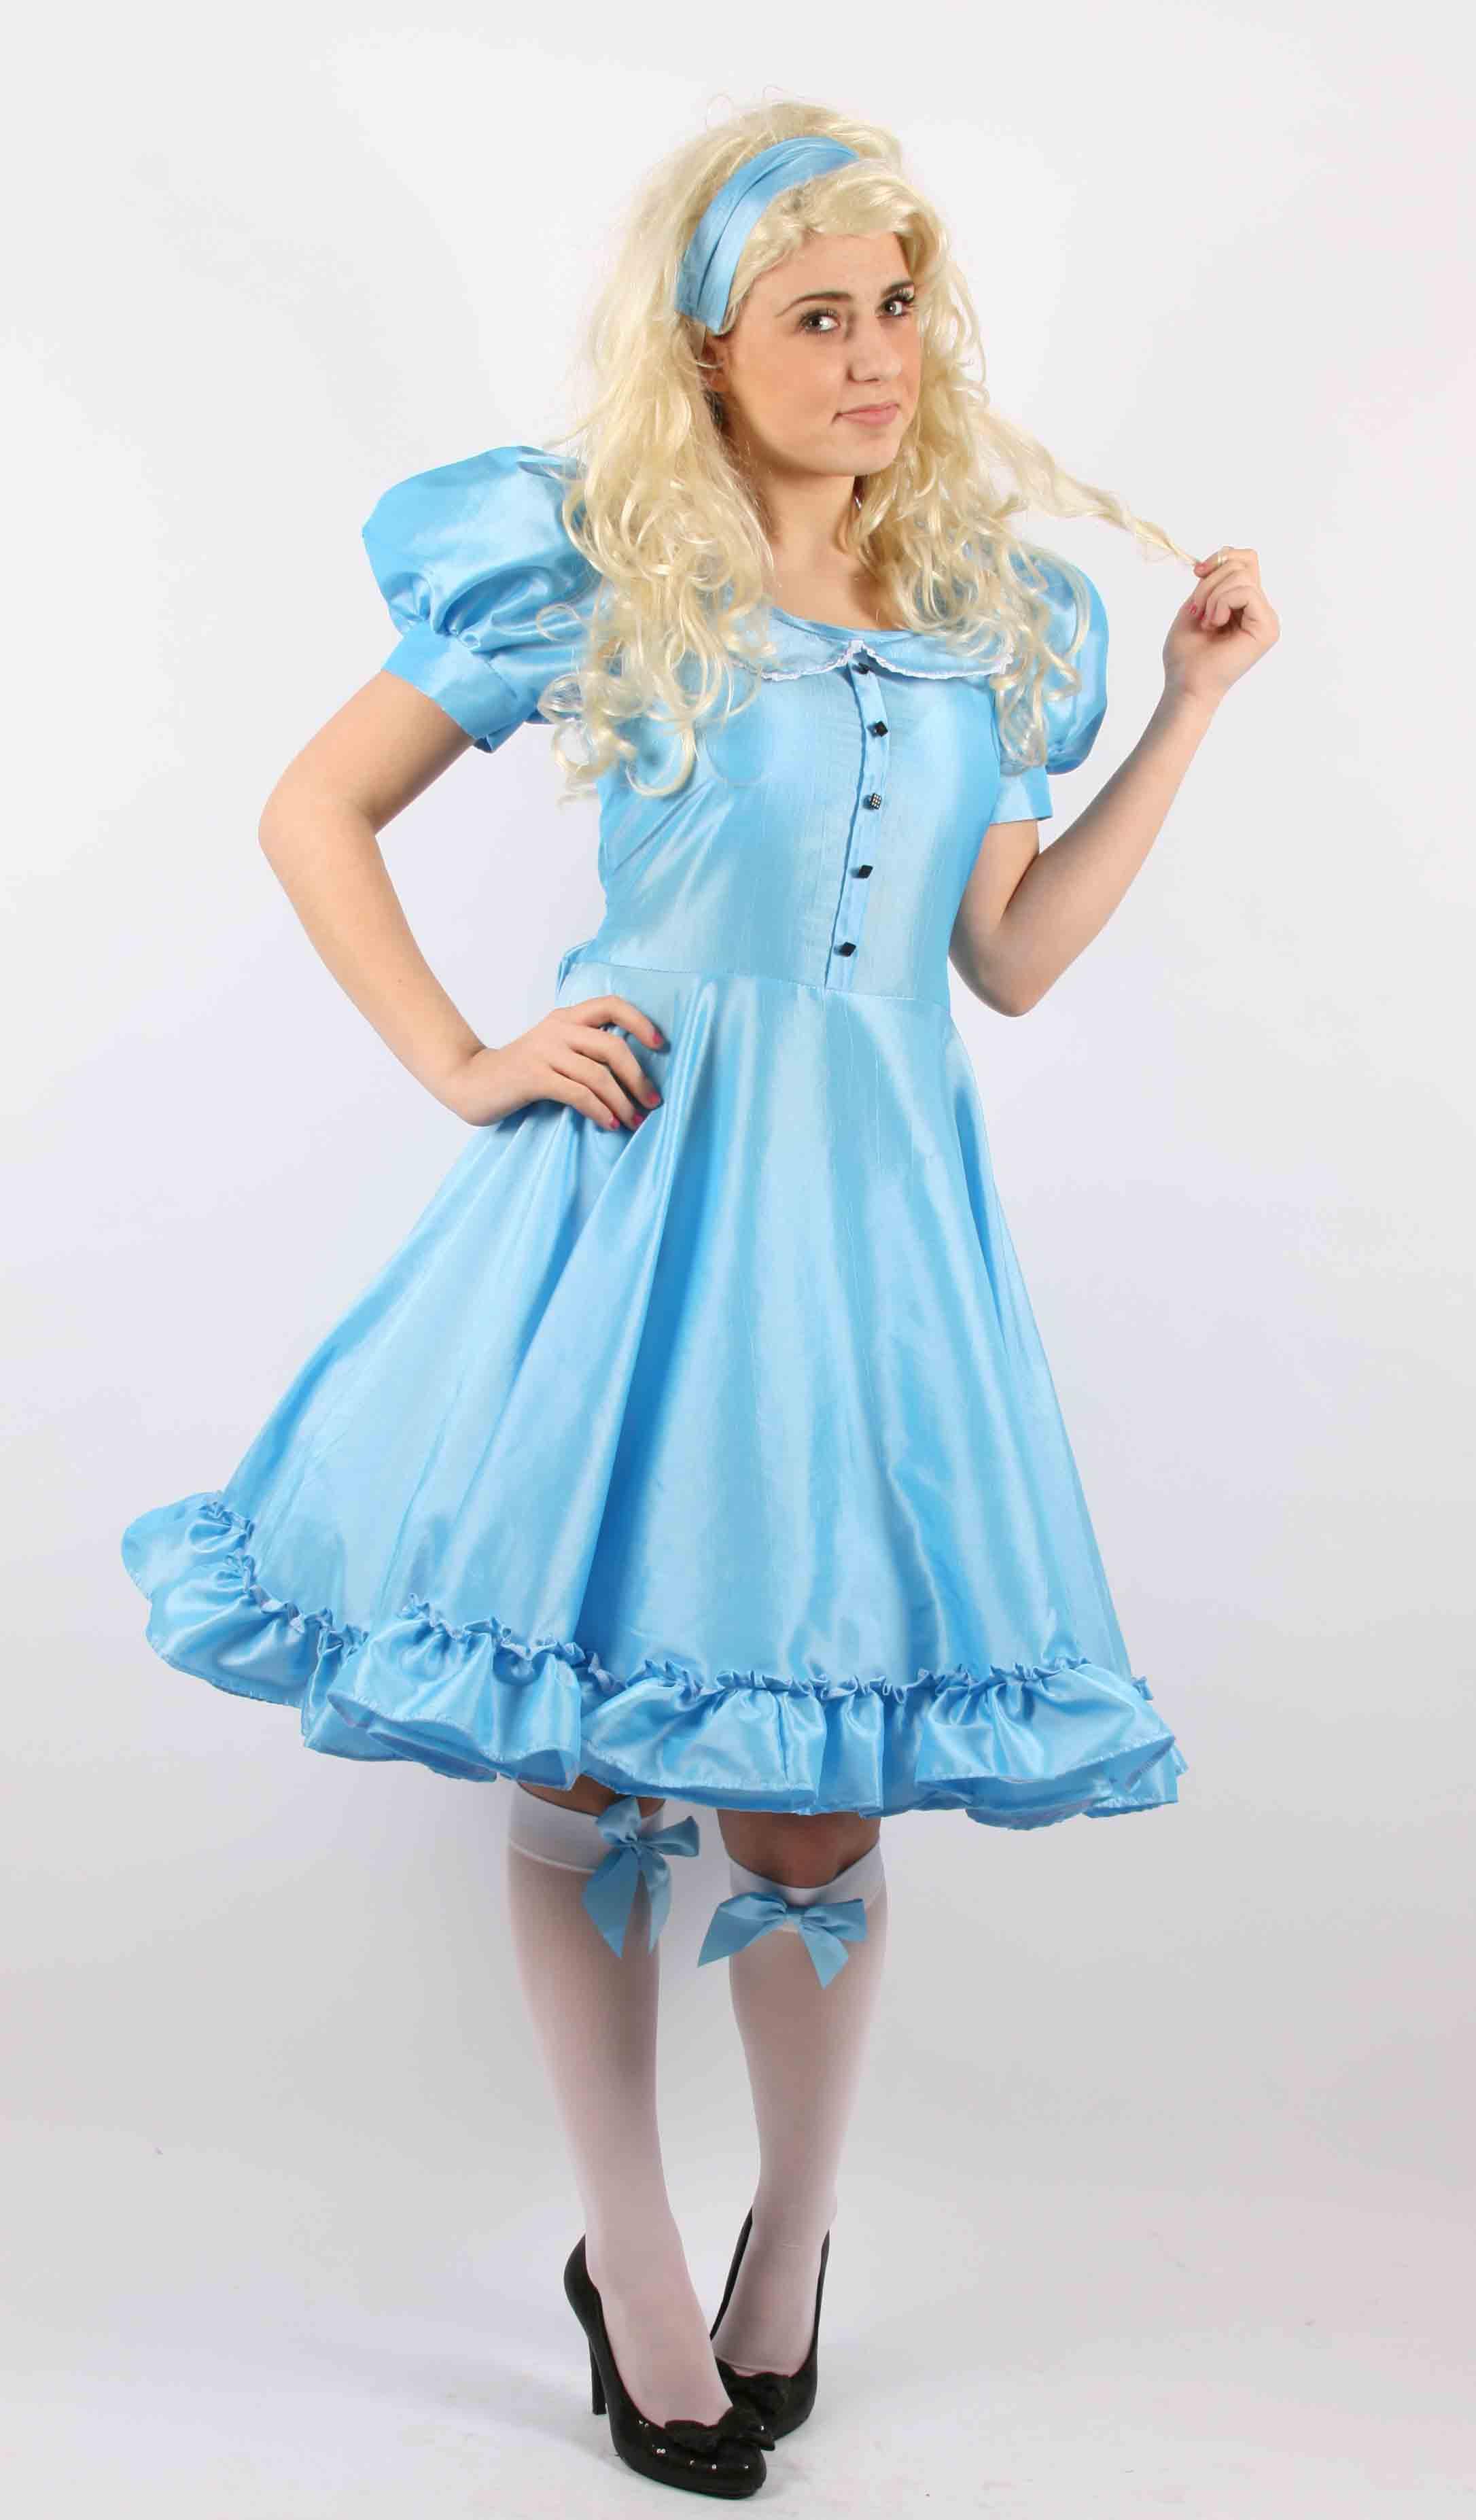 Darth Vader Deluxe Fancy Dress Costume · Darth Vader · Alice In Wonderland    New